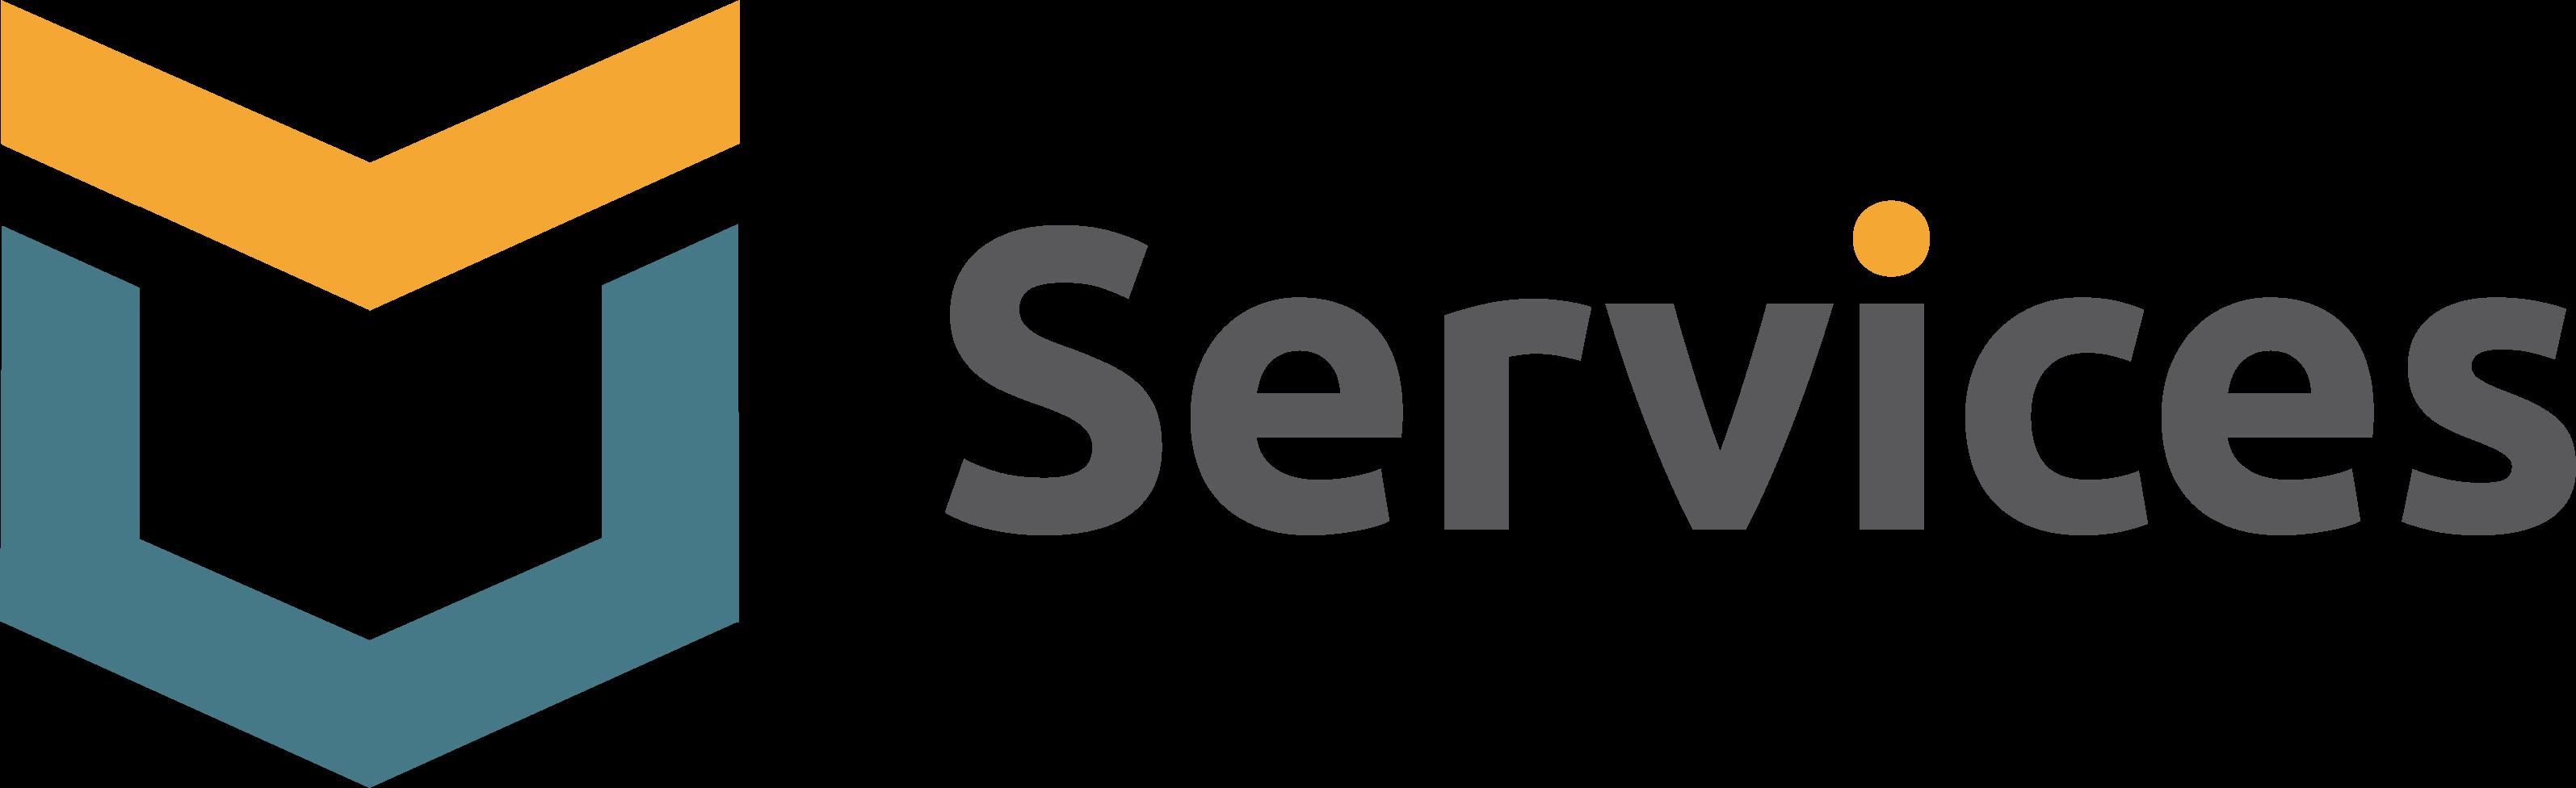 MU Services